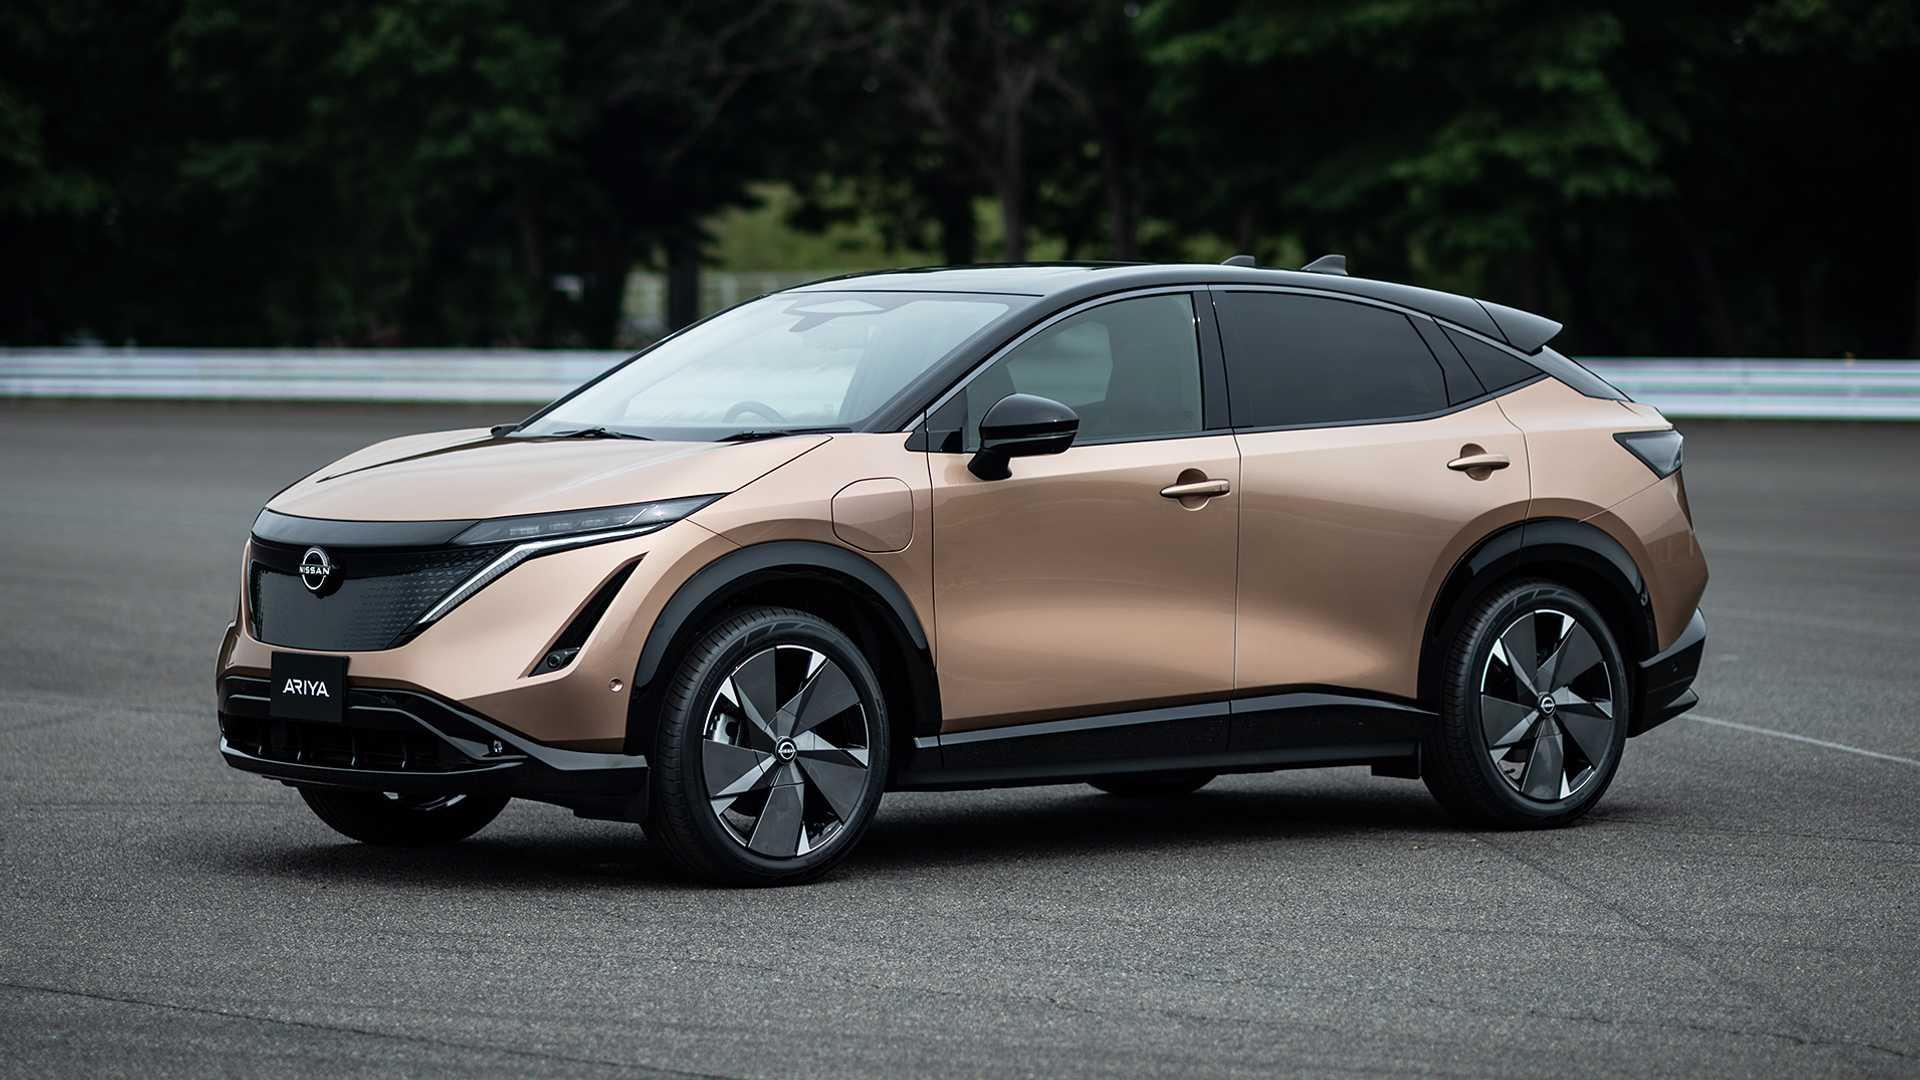 Nissan Ariya вышел в серийное производство